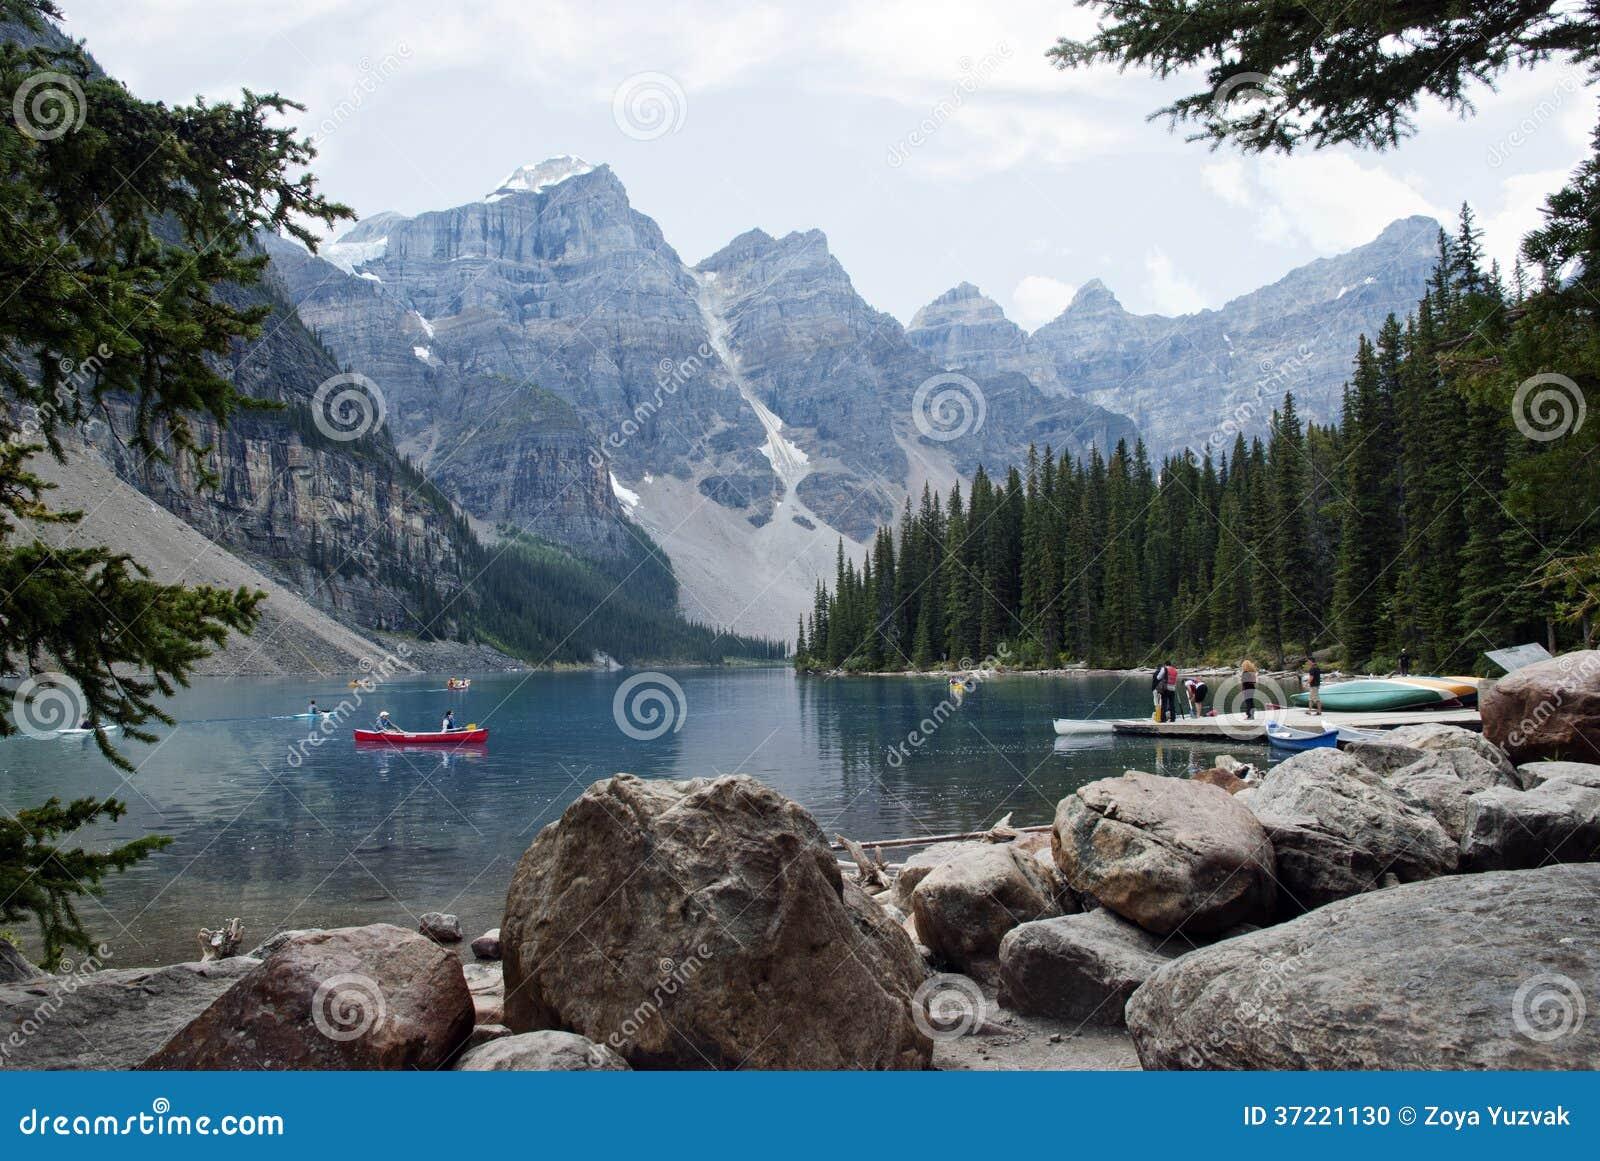 Moraine Lake, Banff National Park, Alberta, Canada Stock Photo - Image: 37221130